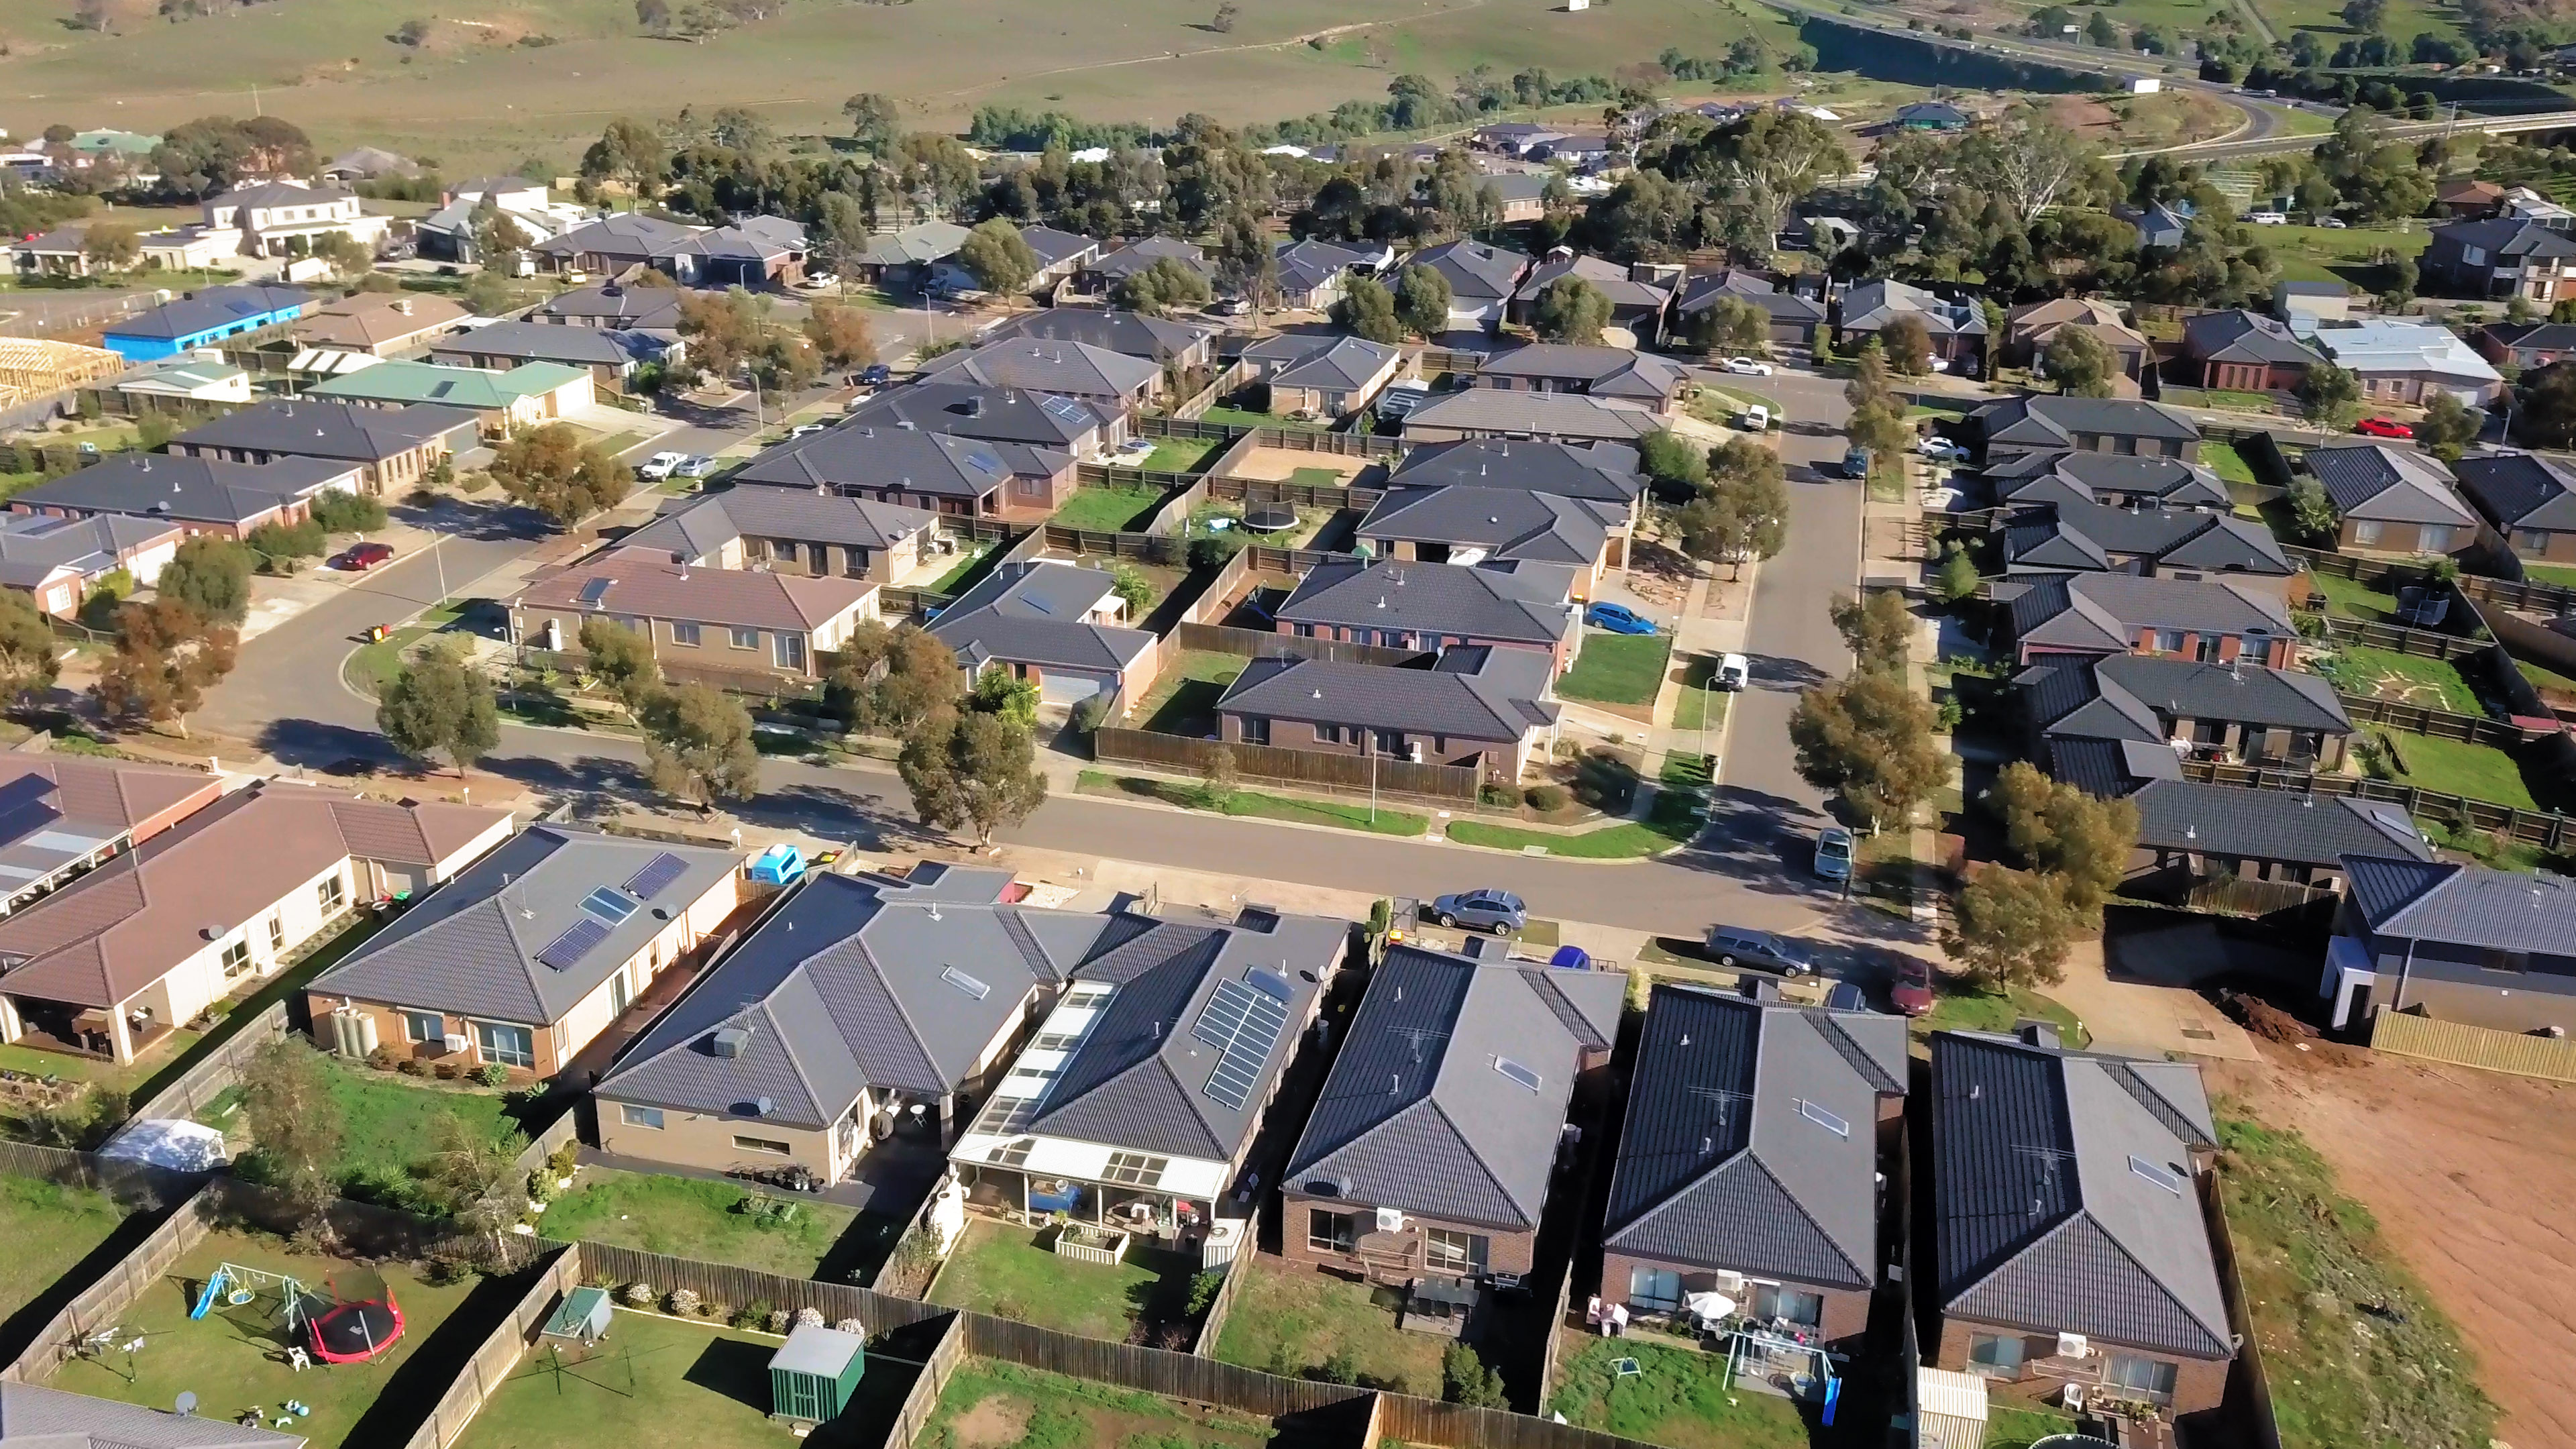 Urban Houses - Drone Videogprahy